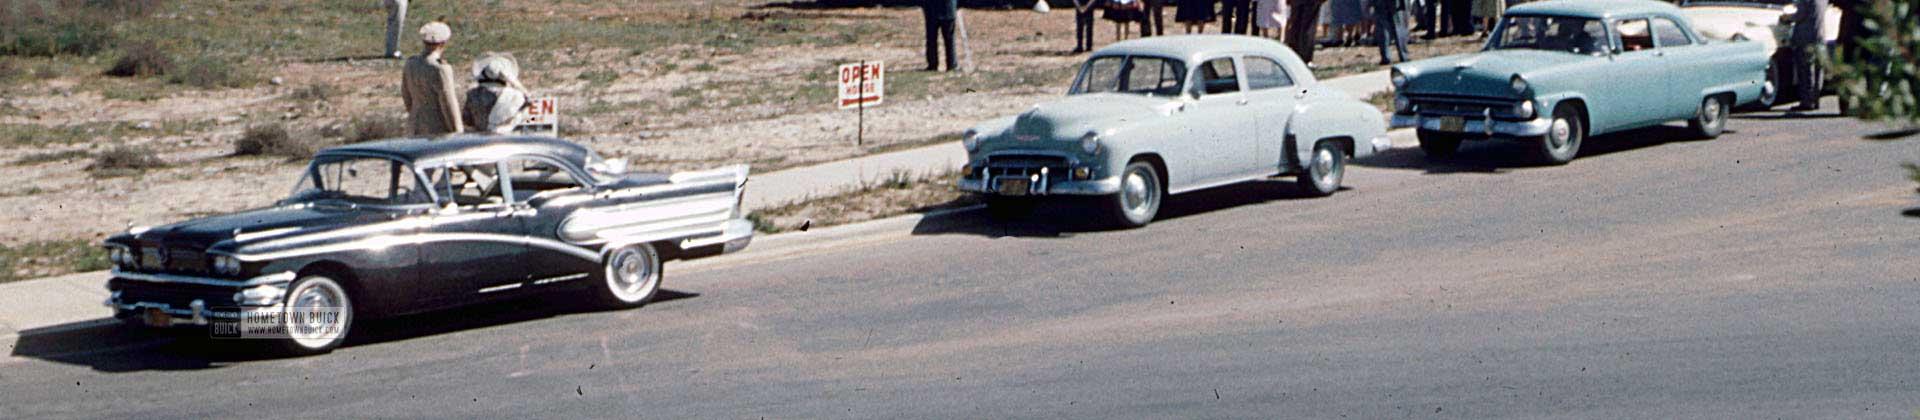 1958 Buick Slider